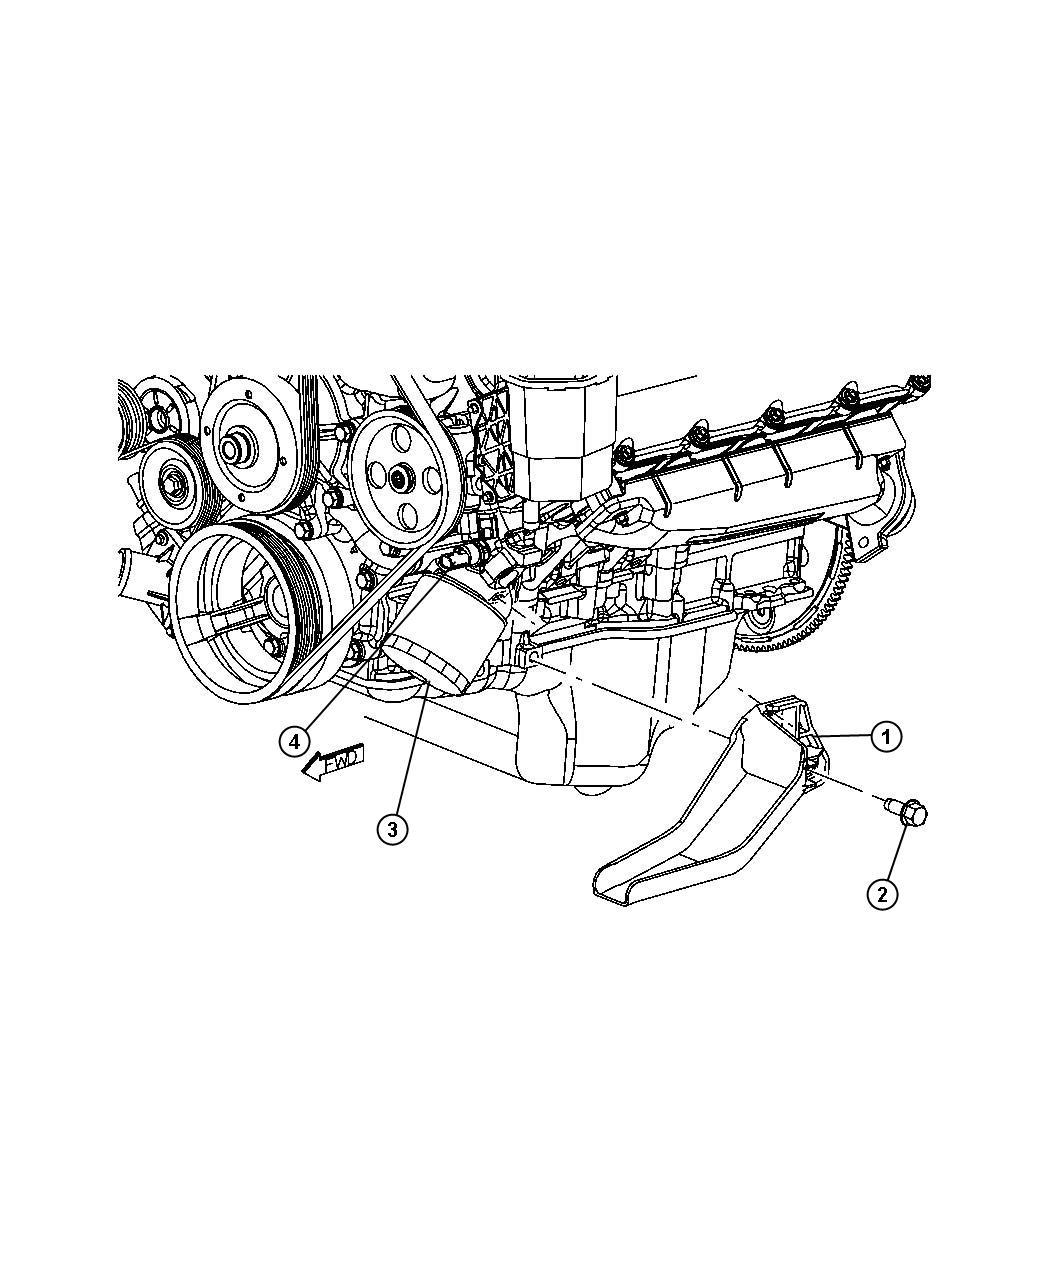 Dodge Ram 1500 Sending unit, switch. Oil pressure. After